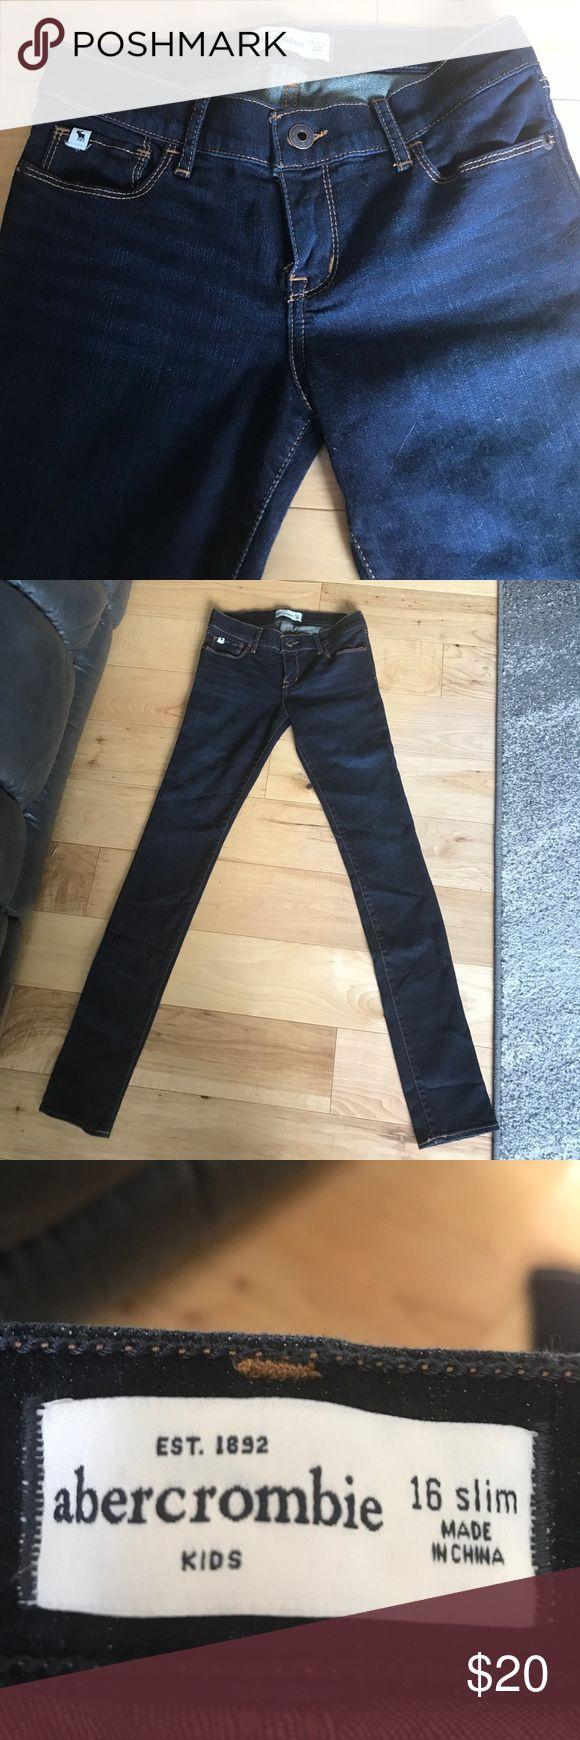 NWT Girls Abercrombie jeans NWT Abercrombie jeans.  Girls, dark wash, skinny fit, size 16S abercrombie kids Bottoms Jeans